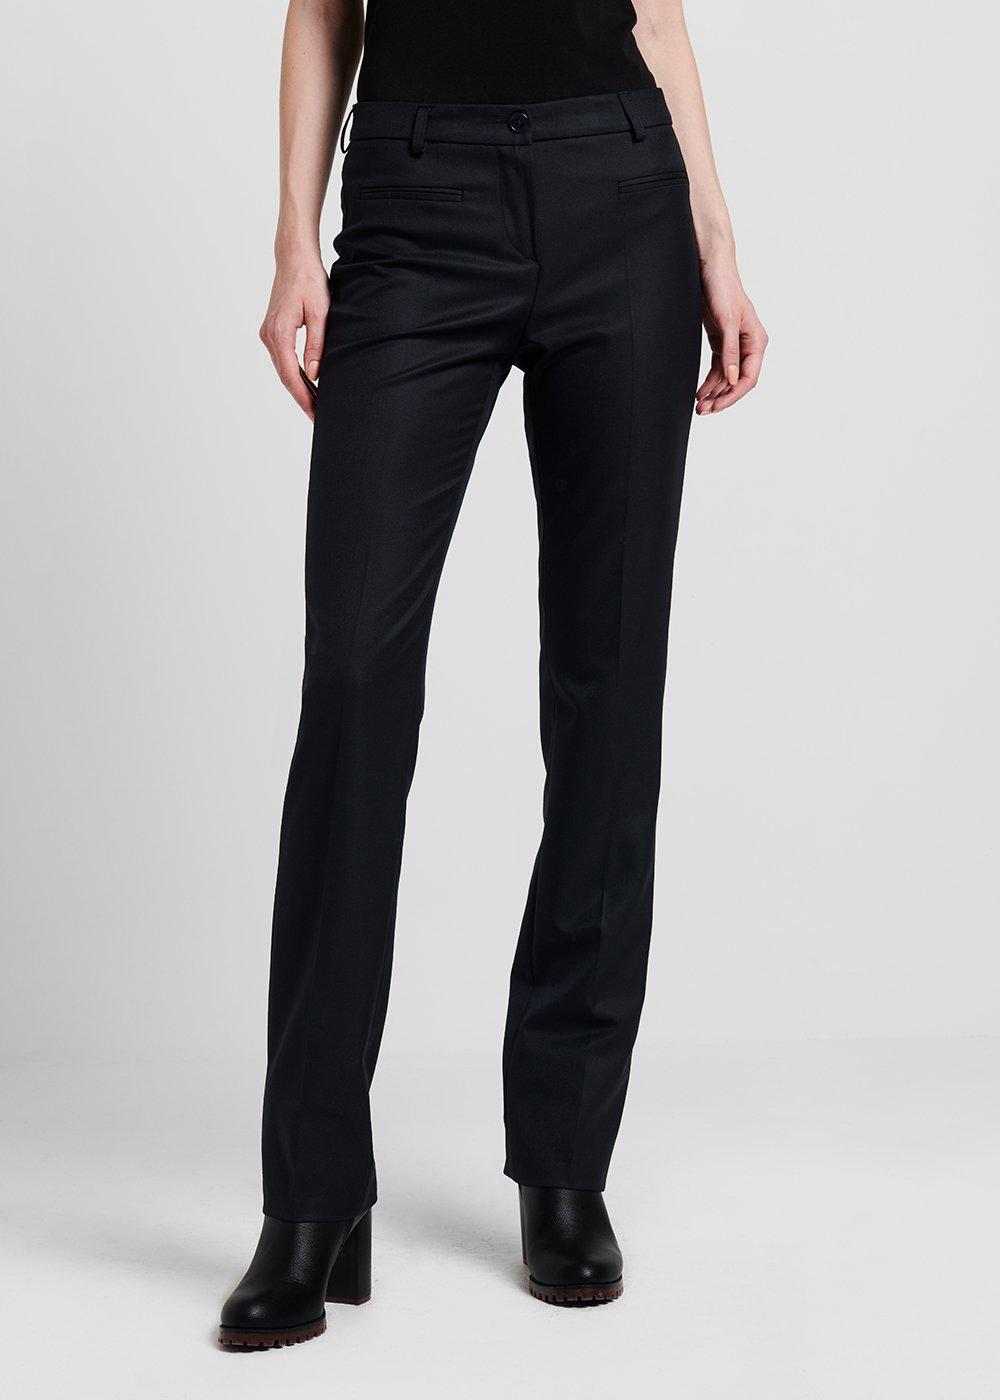 Cigarette trousers in flannel fabric - Dark Blue - Woman